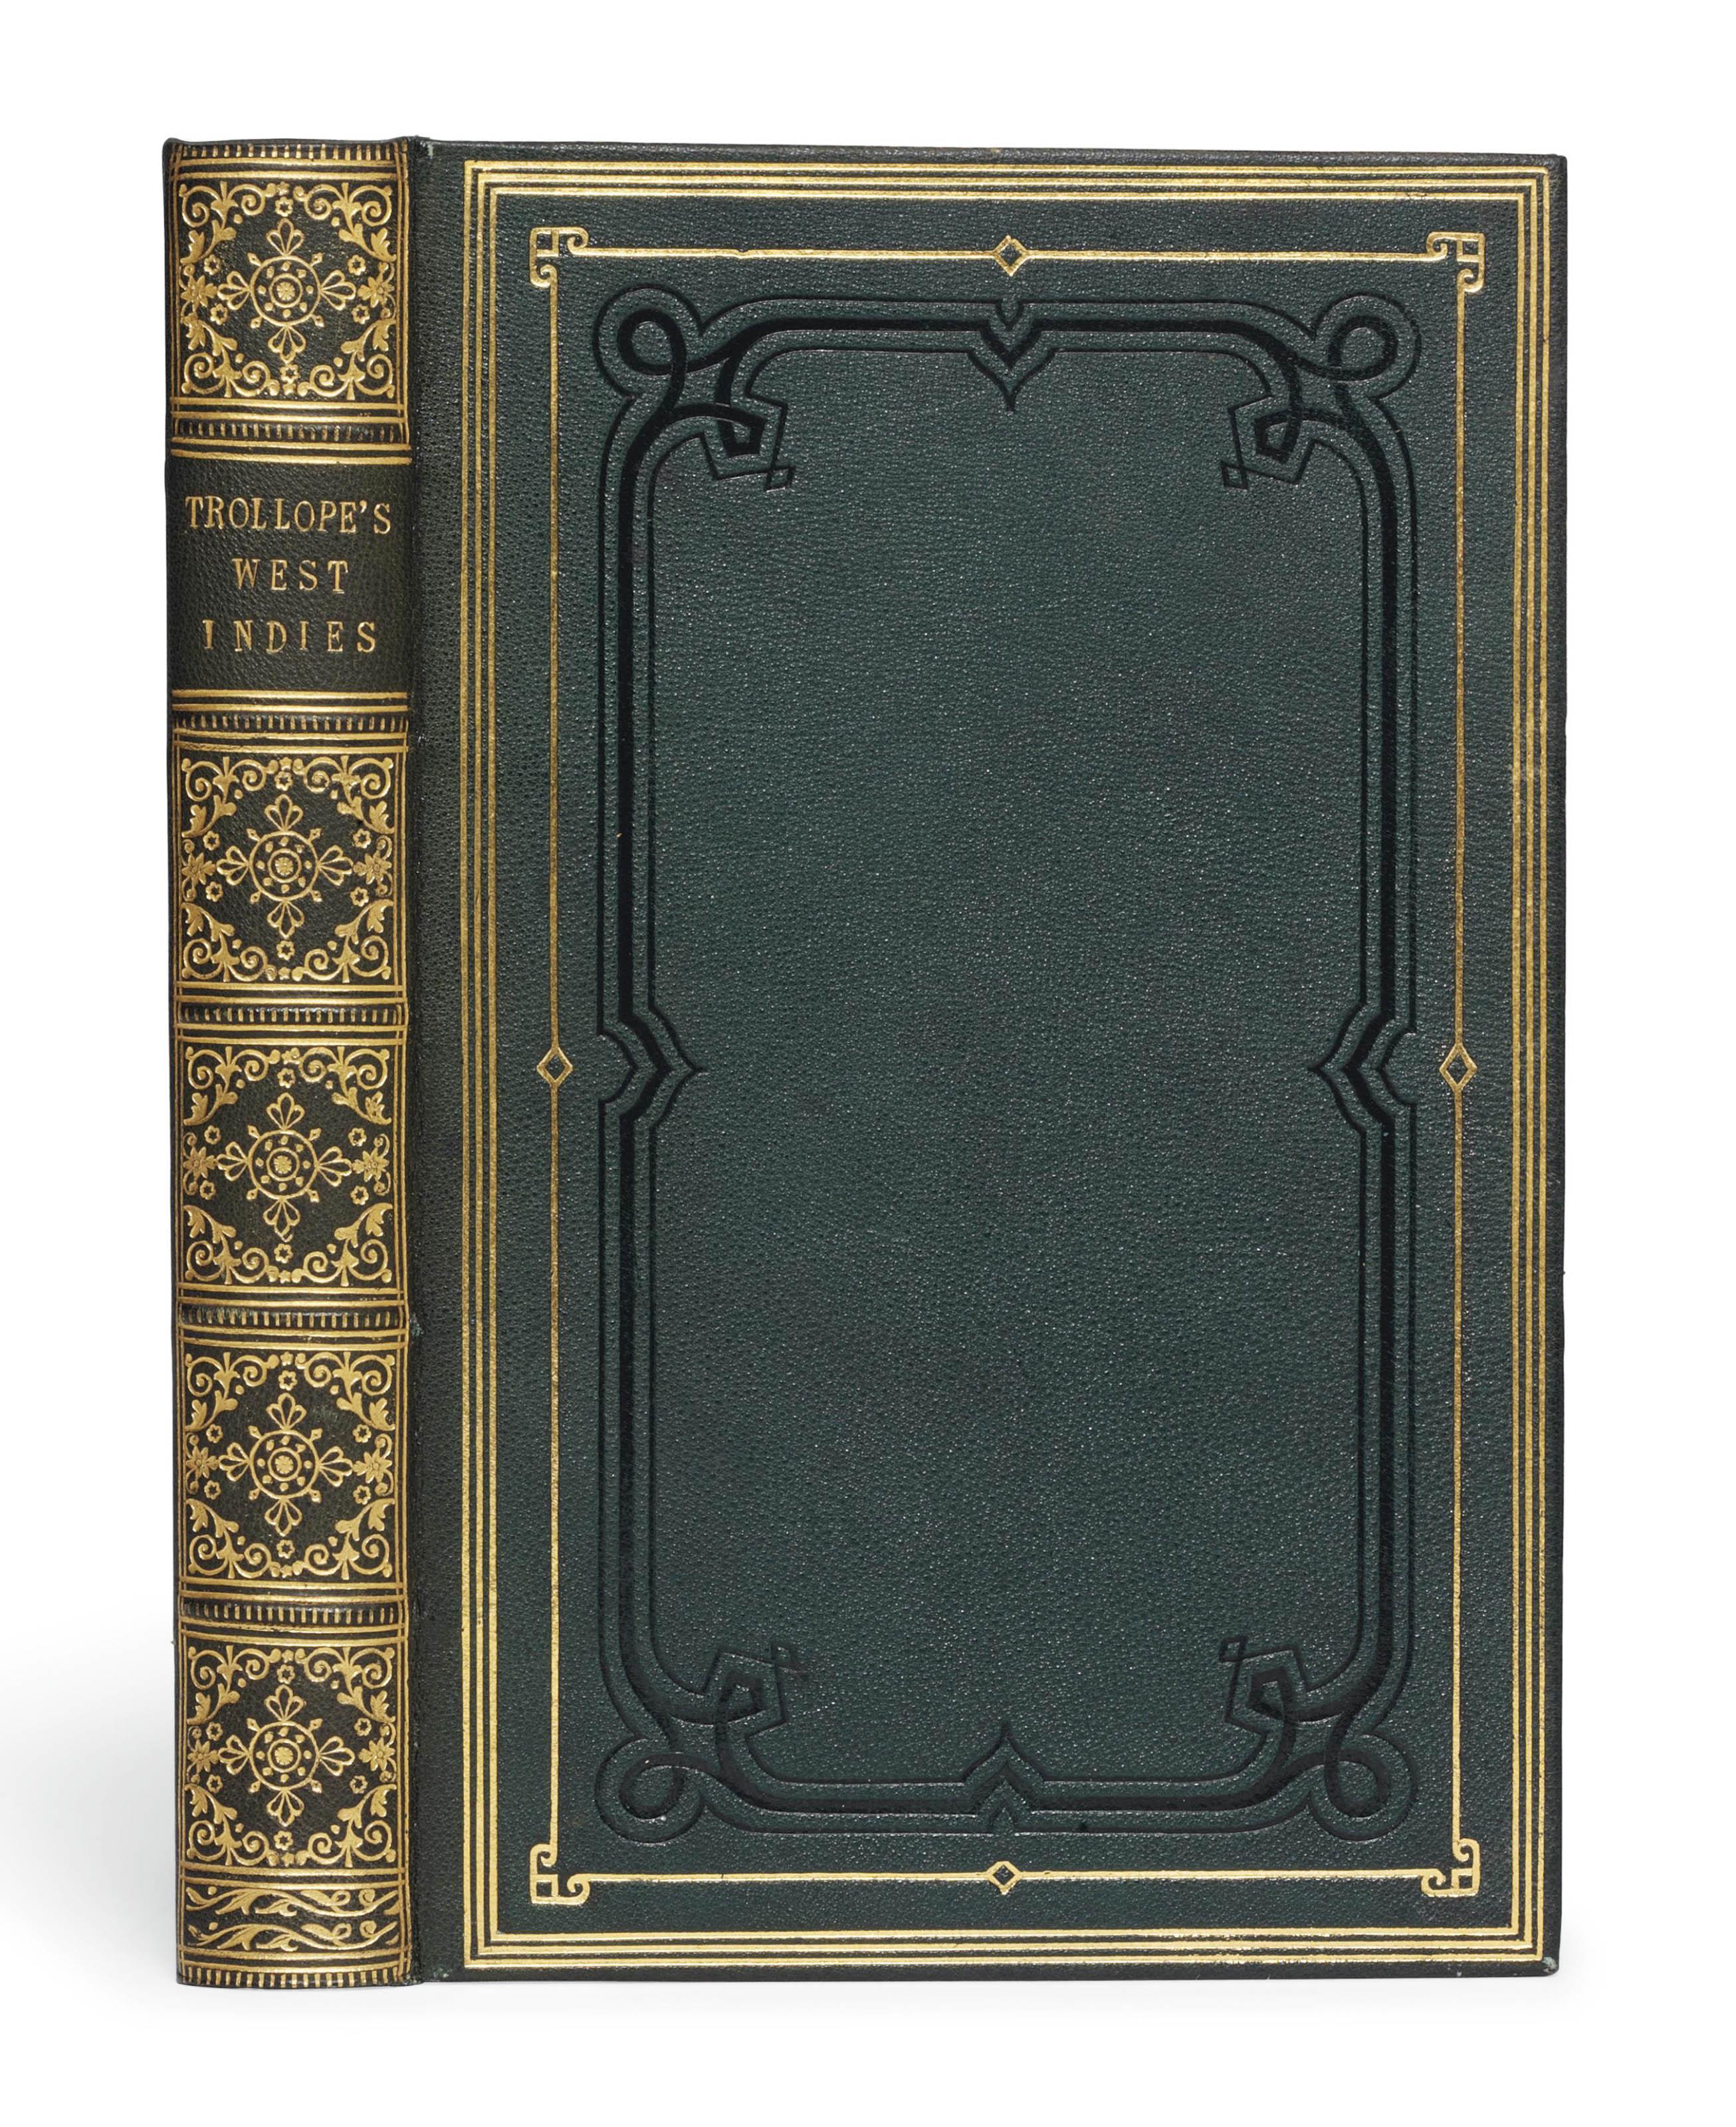 TROLLOPE, Anthony (1815-1882).